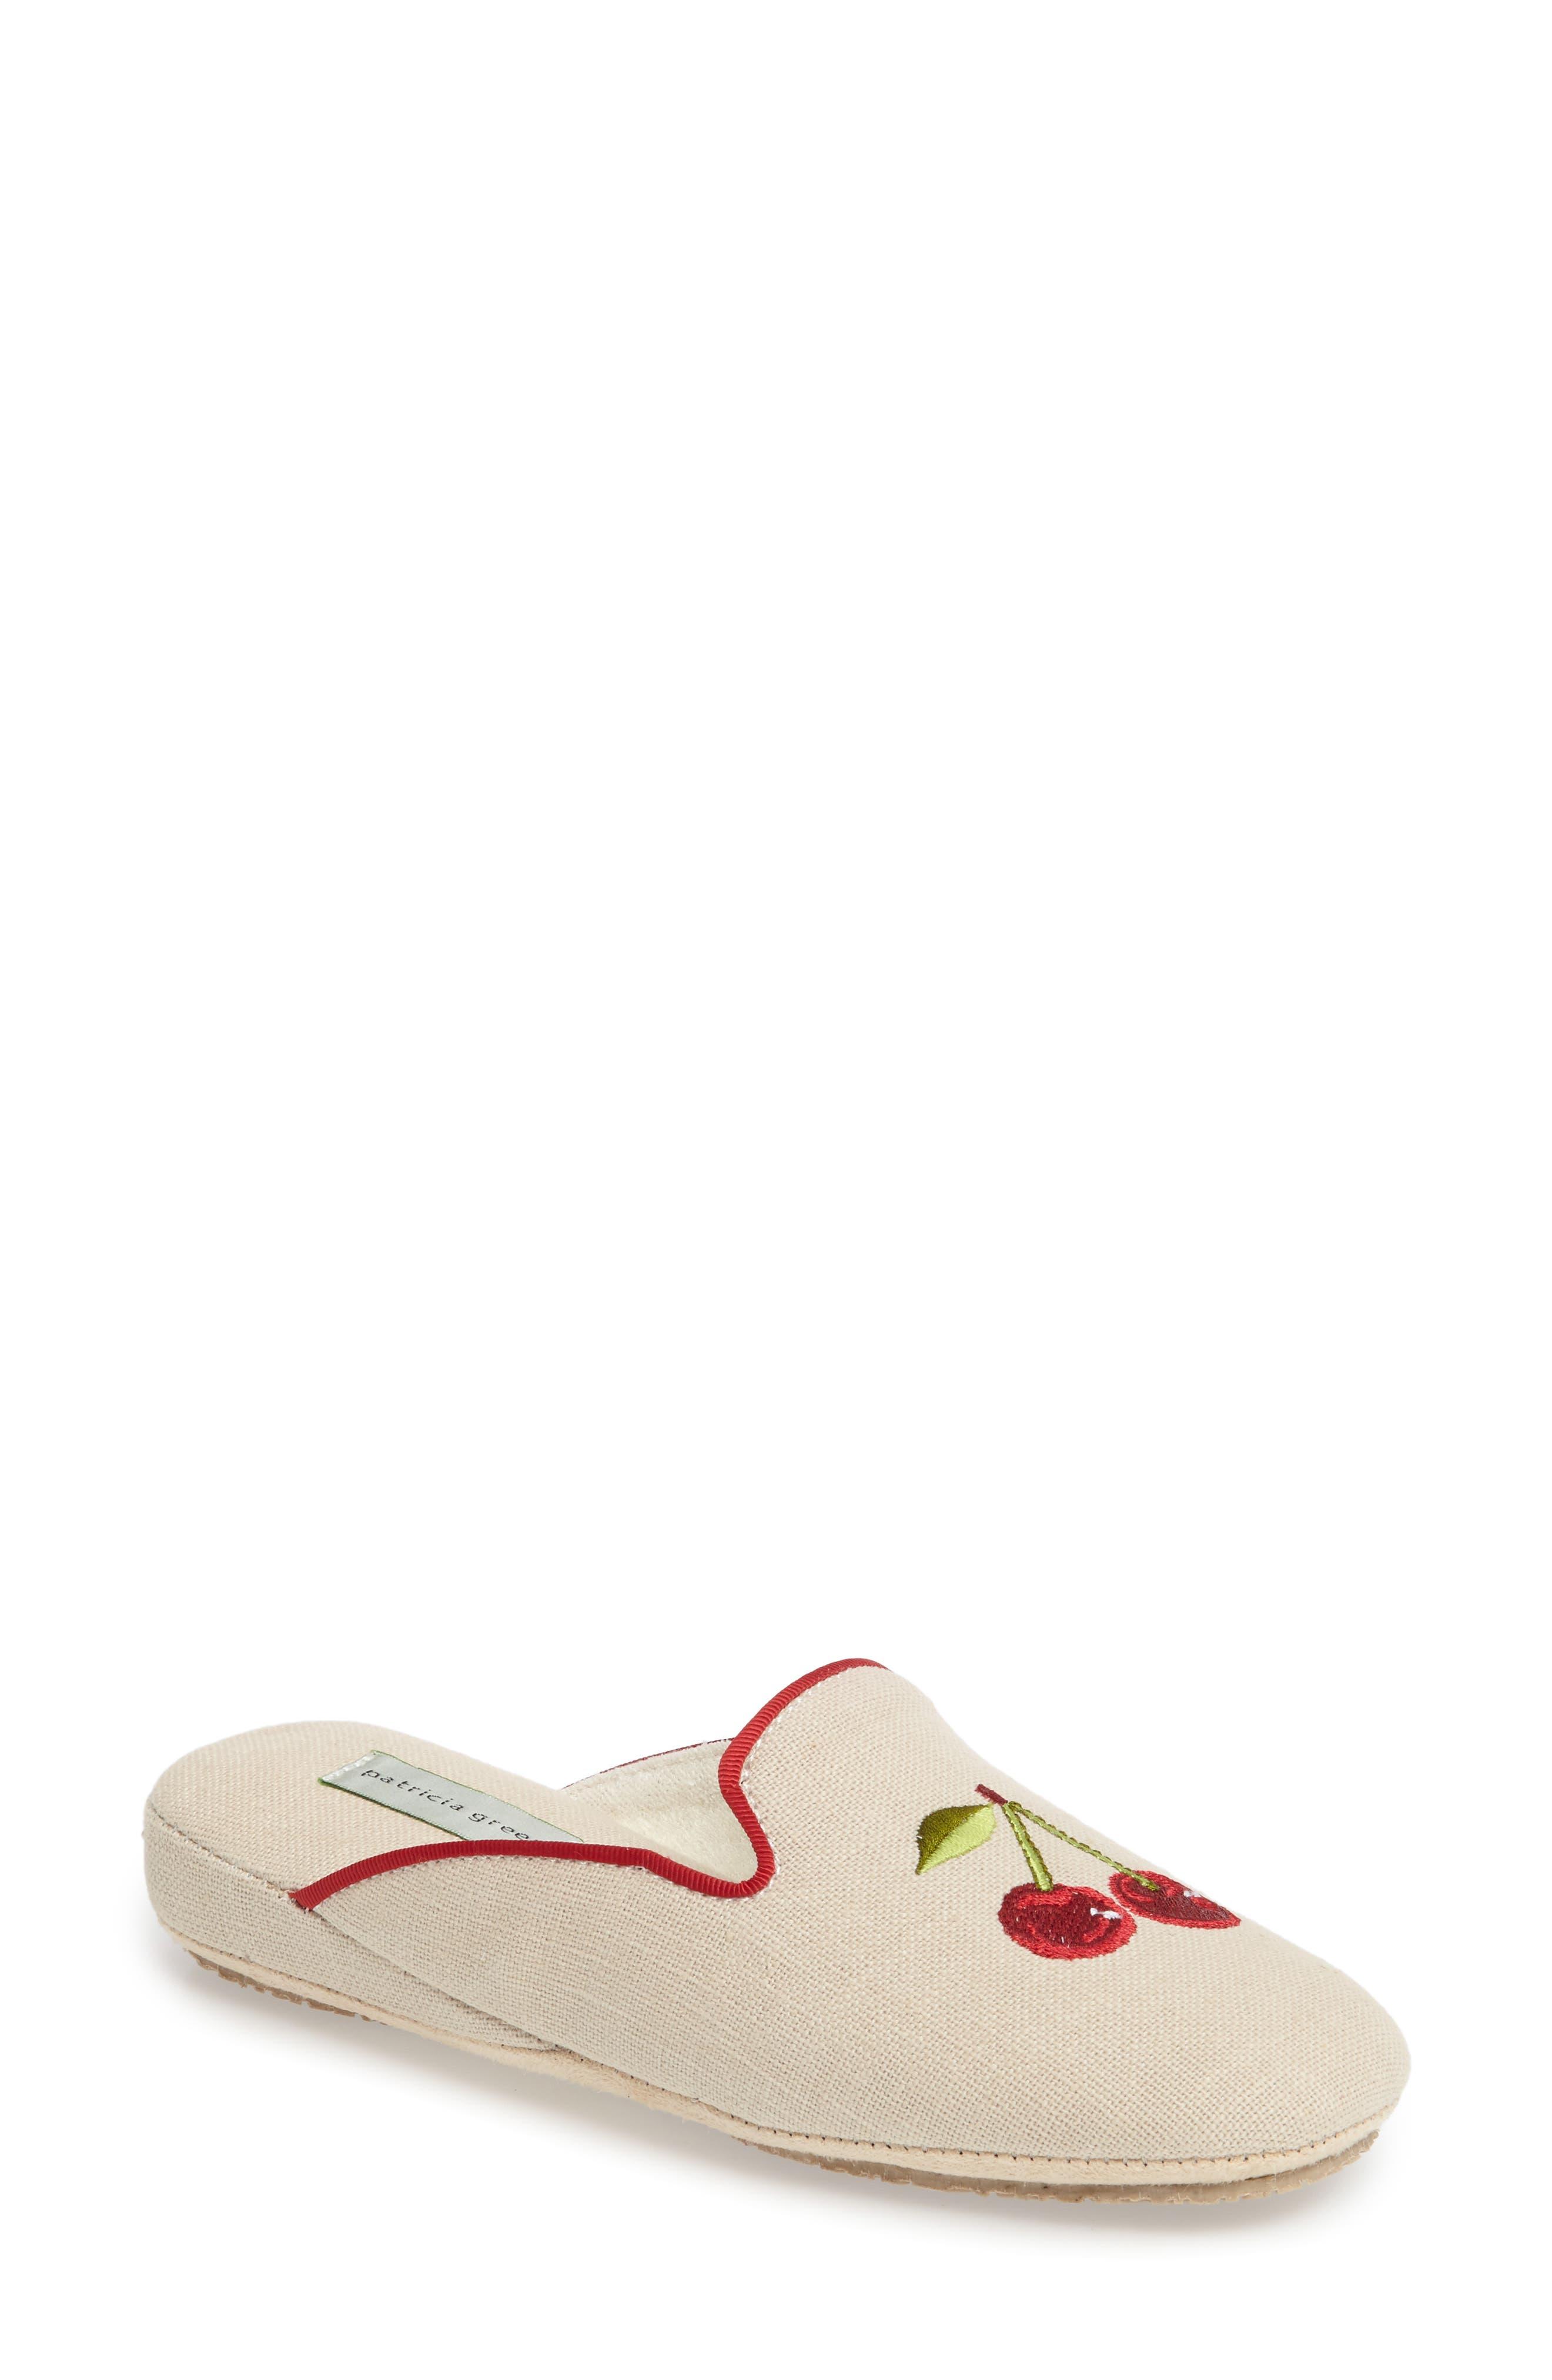 Cherries Slipper,                         Main,                         color, 252